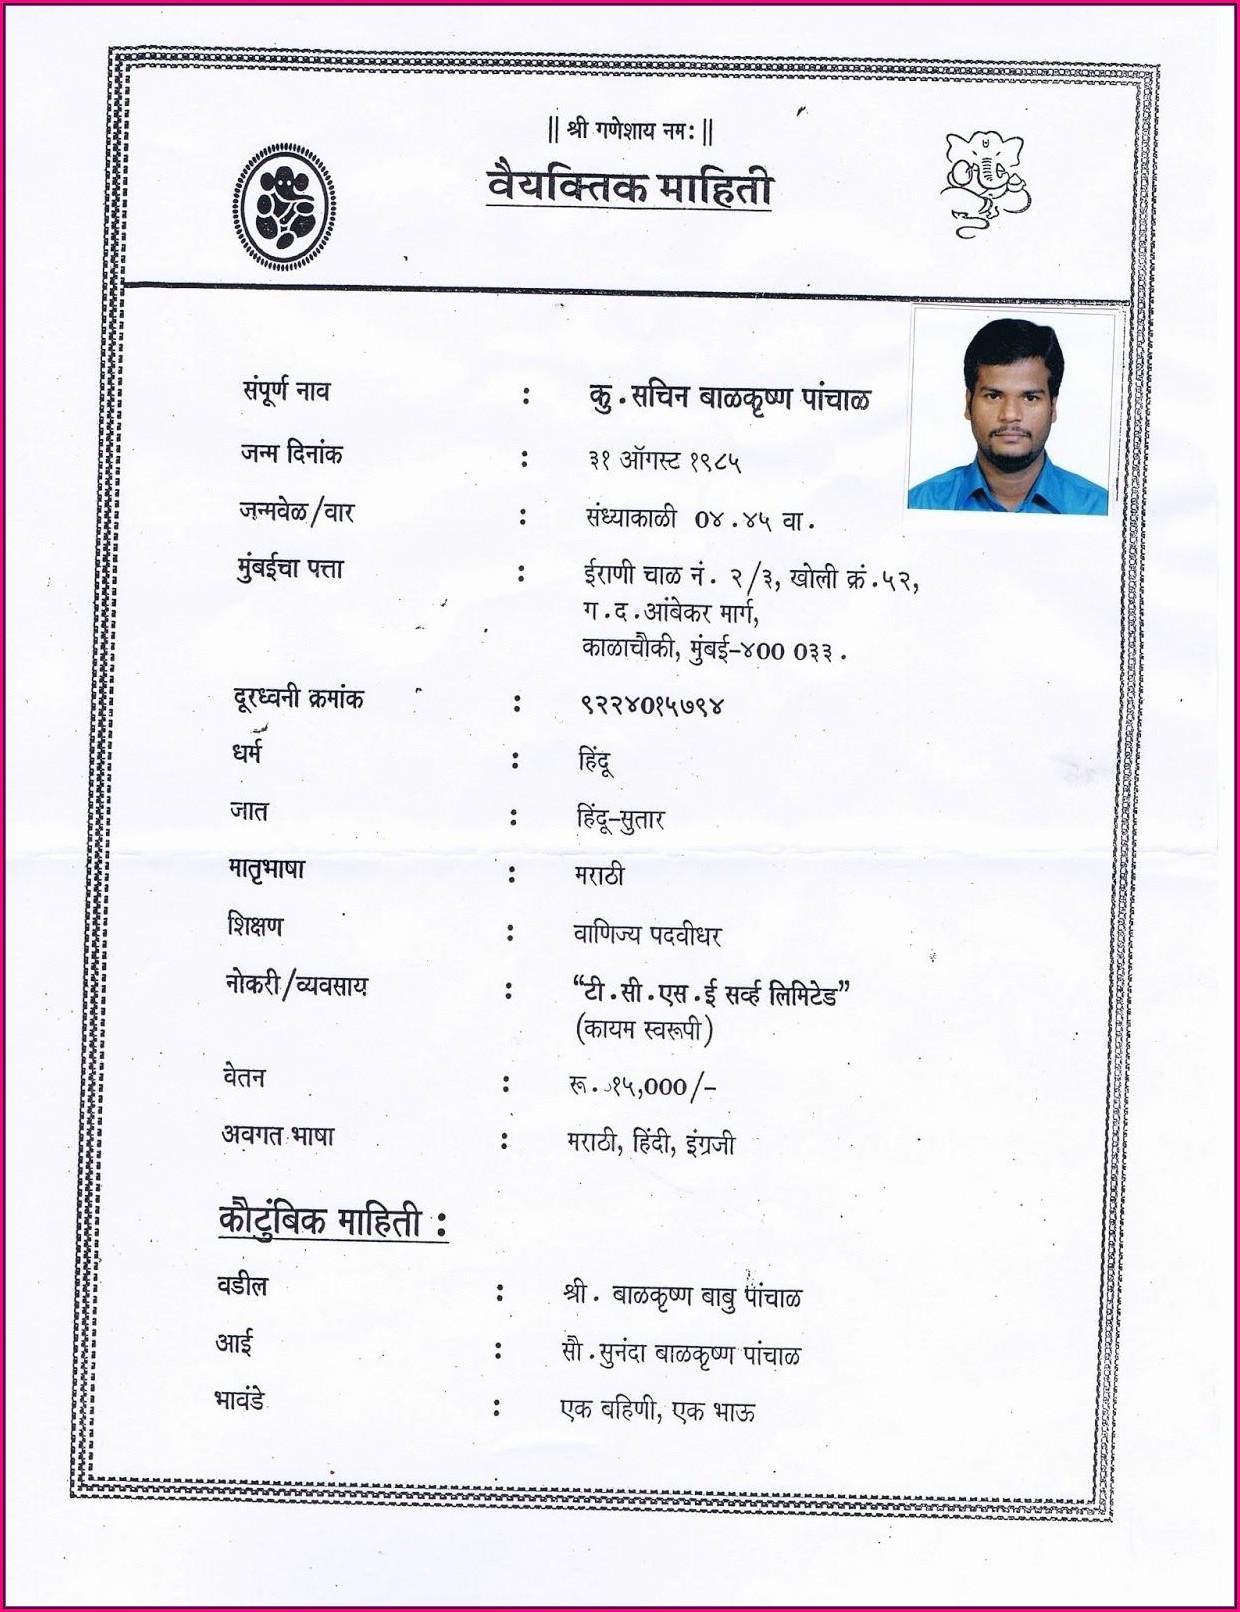 Marriage Resume Format For Boy In Marathi